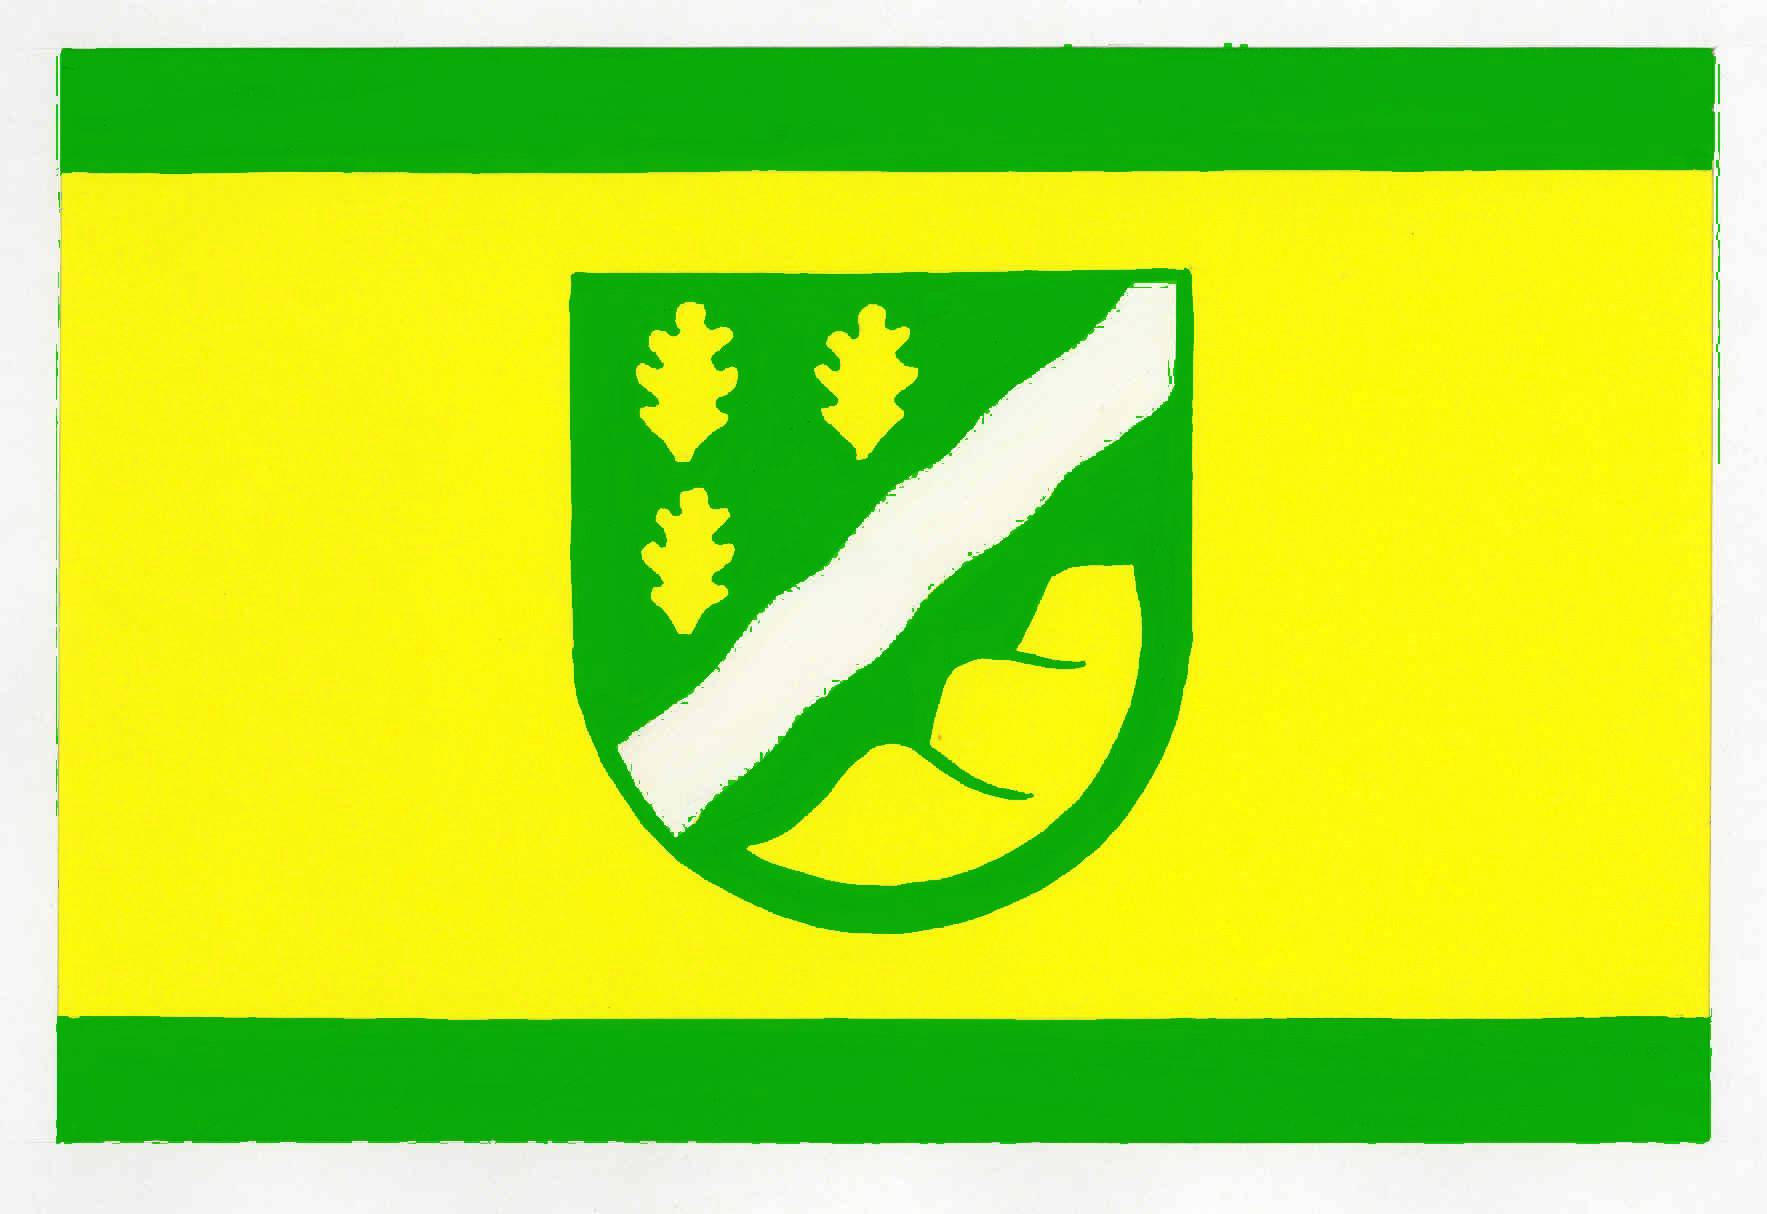 Flagge GemeindeRehm-Flehde-Bargen, Kreis Dithmarschen